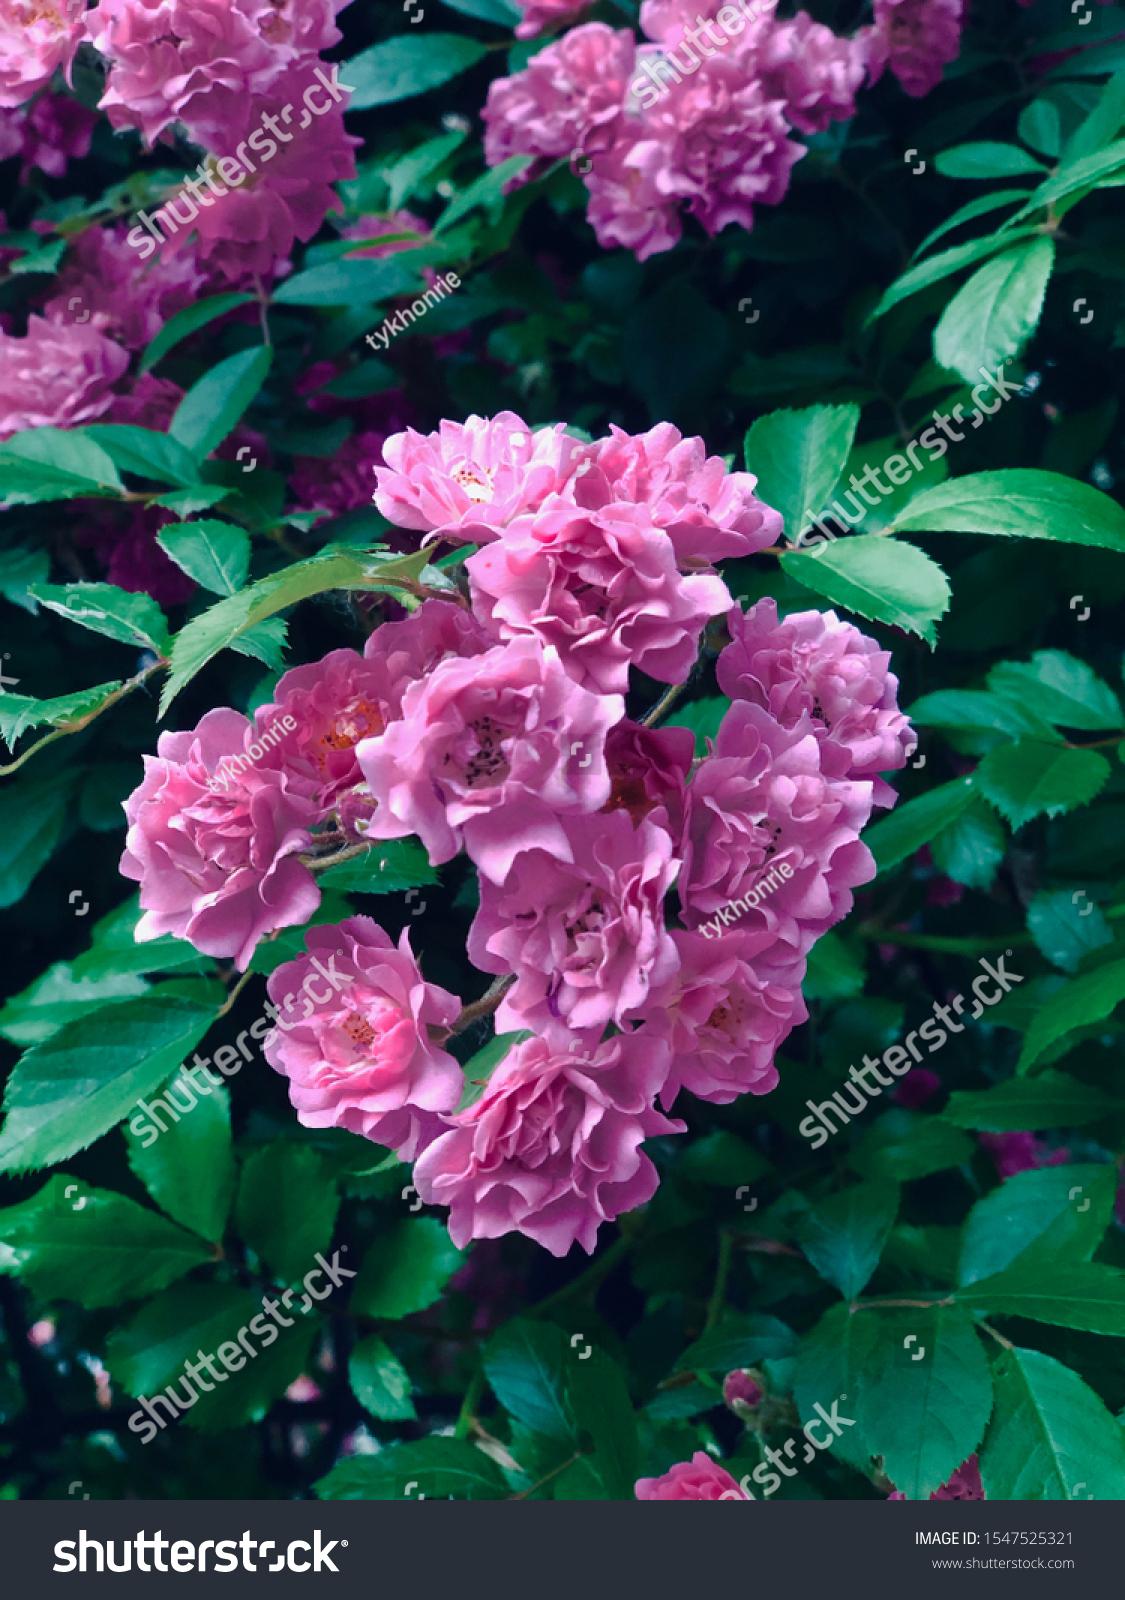 stock-photo-pink-rose-flower-image-beaut